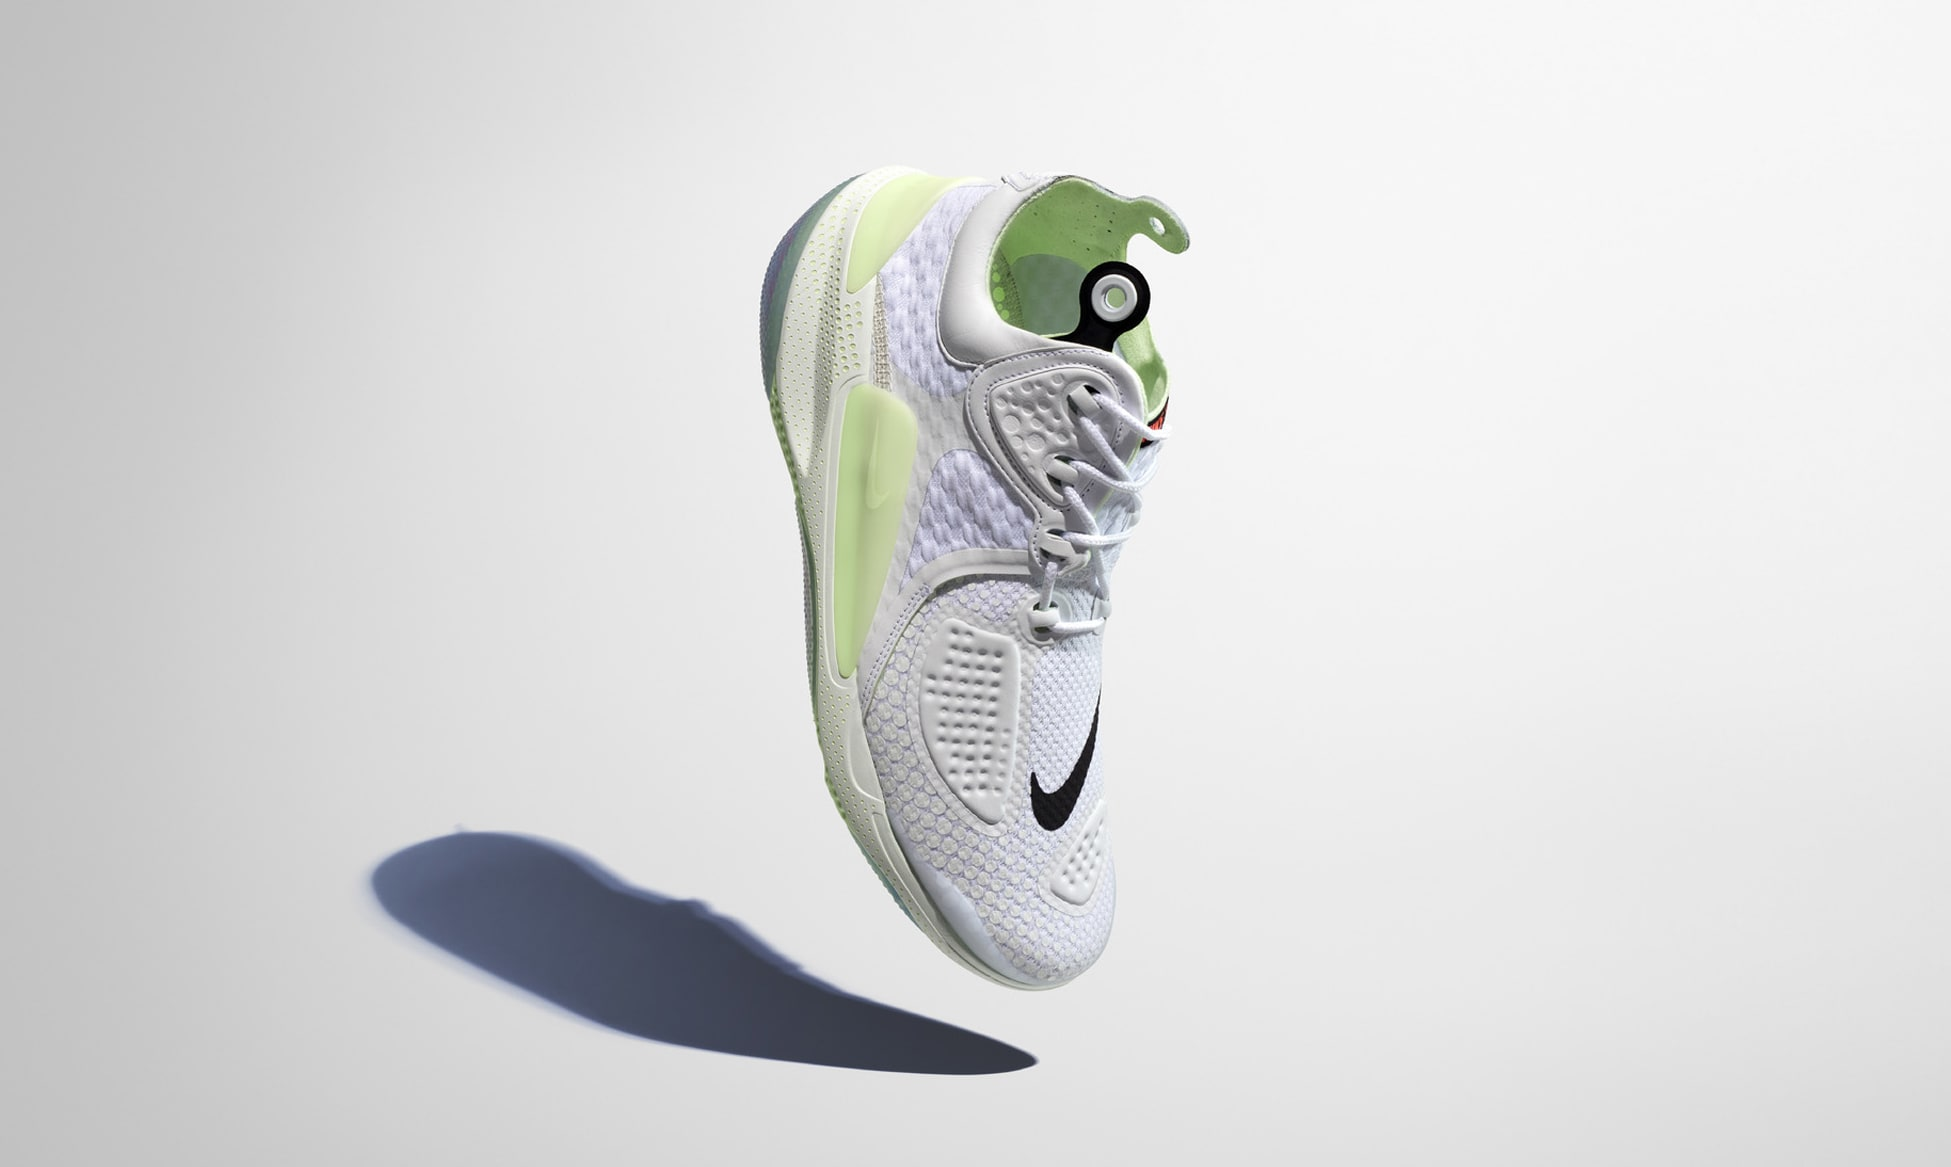 Nike Joyride NSW Setter (Top)